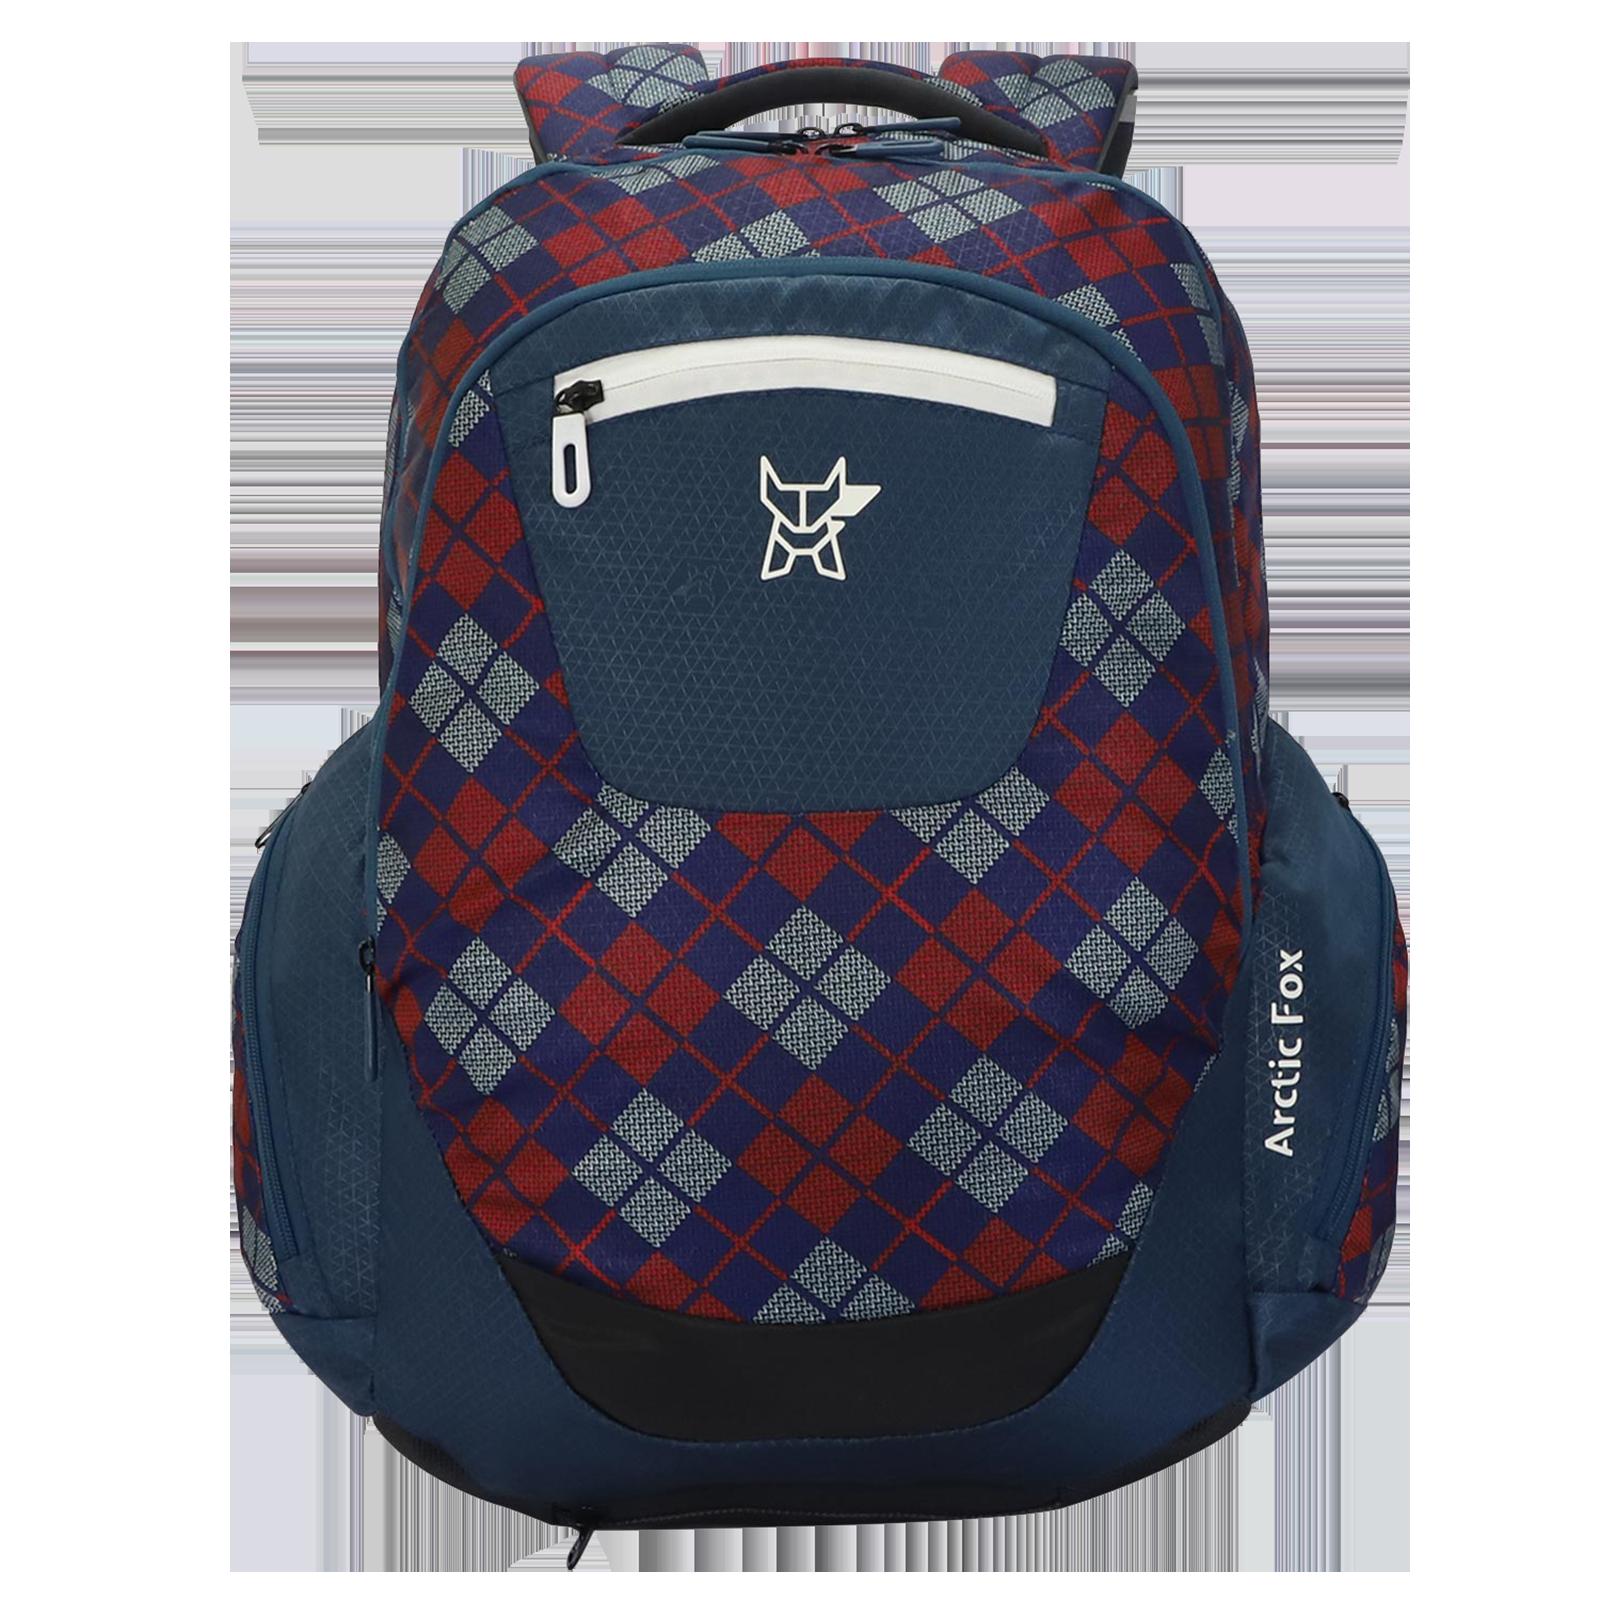 Arctic Fox Scott Checks 33.5 Litres Polyester Backpack (SBS Branded Zippers, FJUBPKDDVON037034, Deep Dive)_1